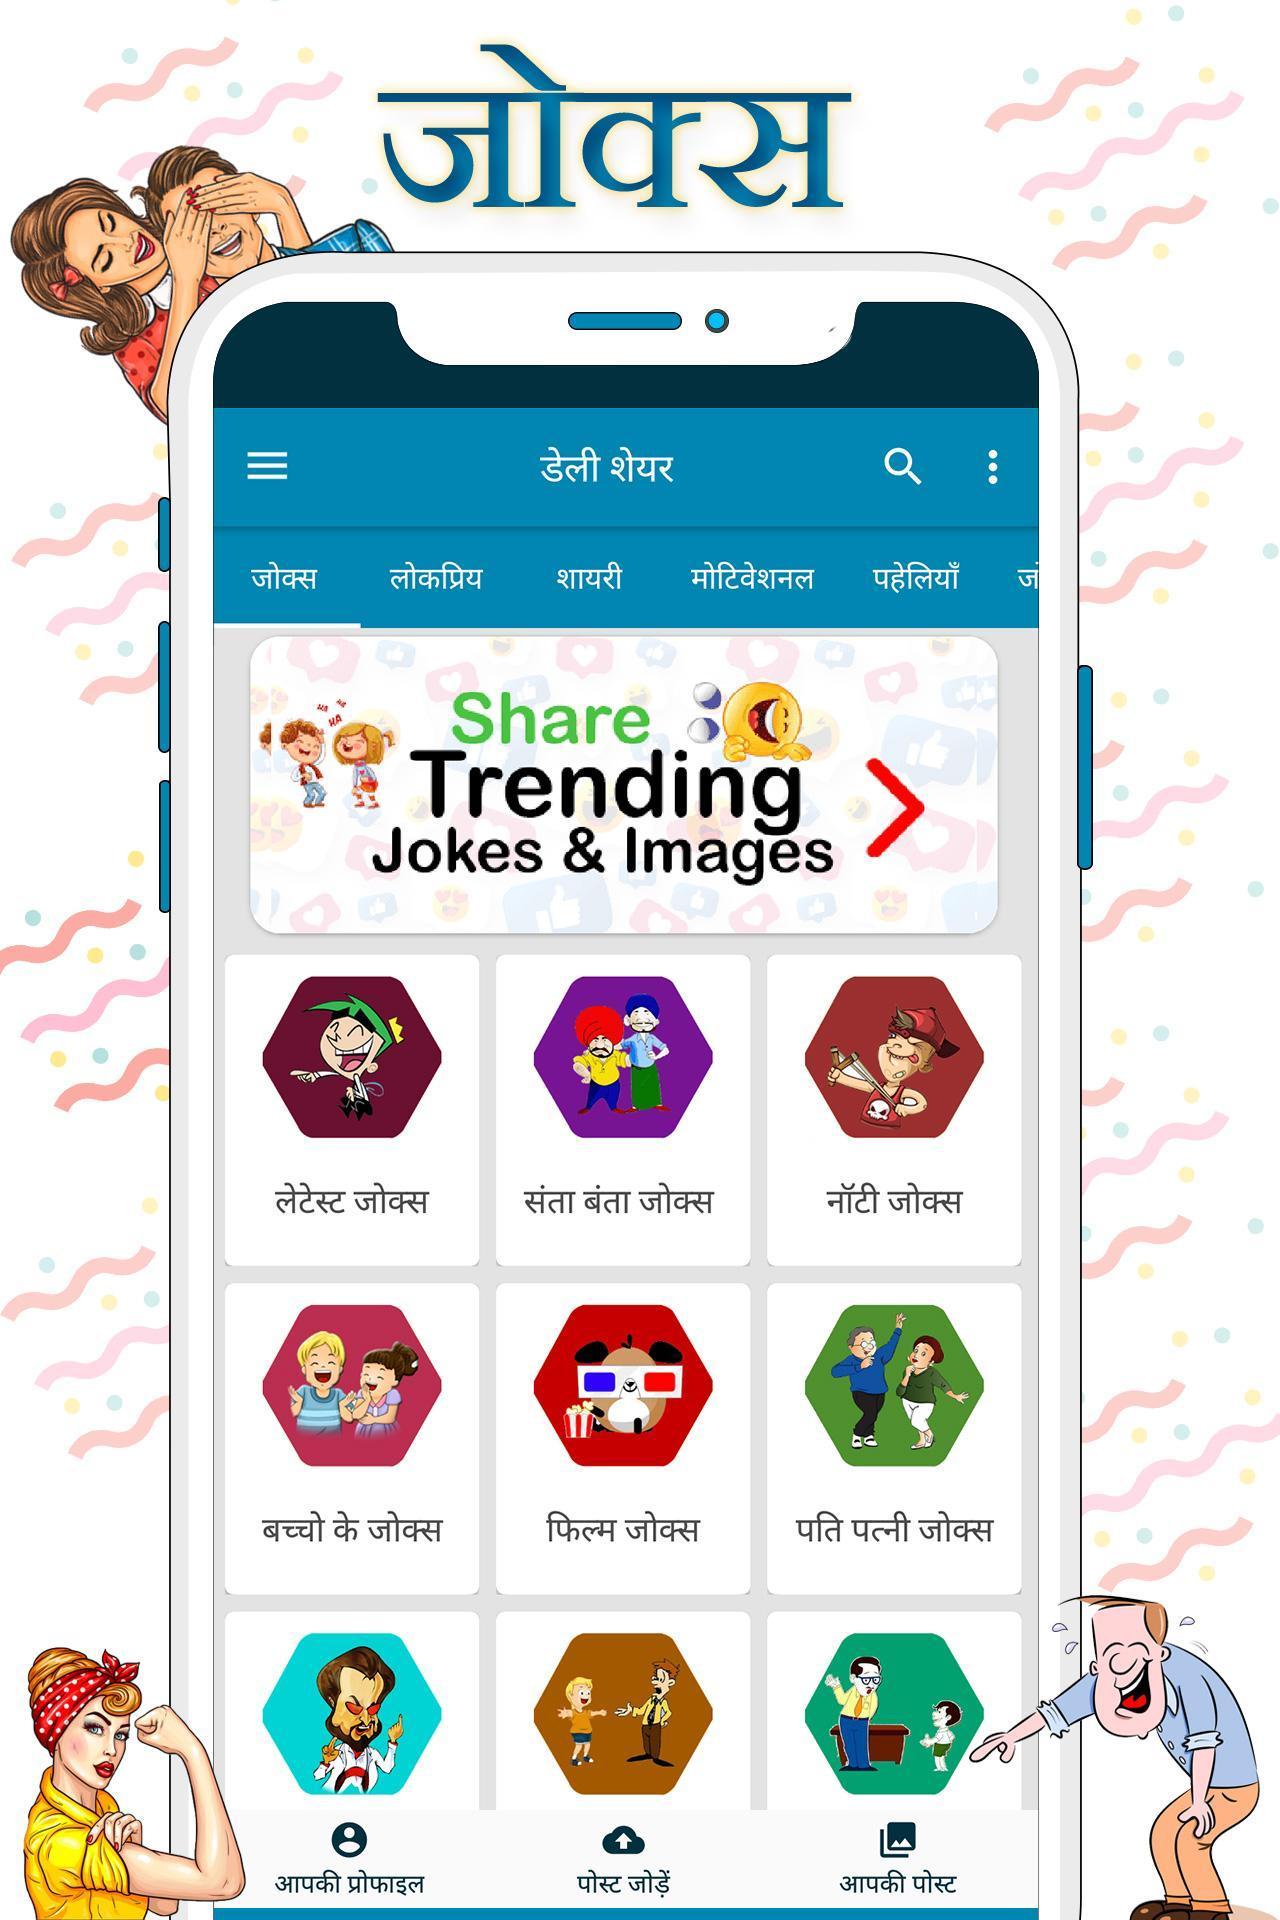 Hindi Funny Jokes 2019 Shayari Chutkule Latest For Android